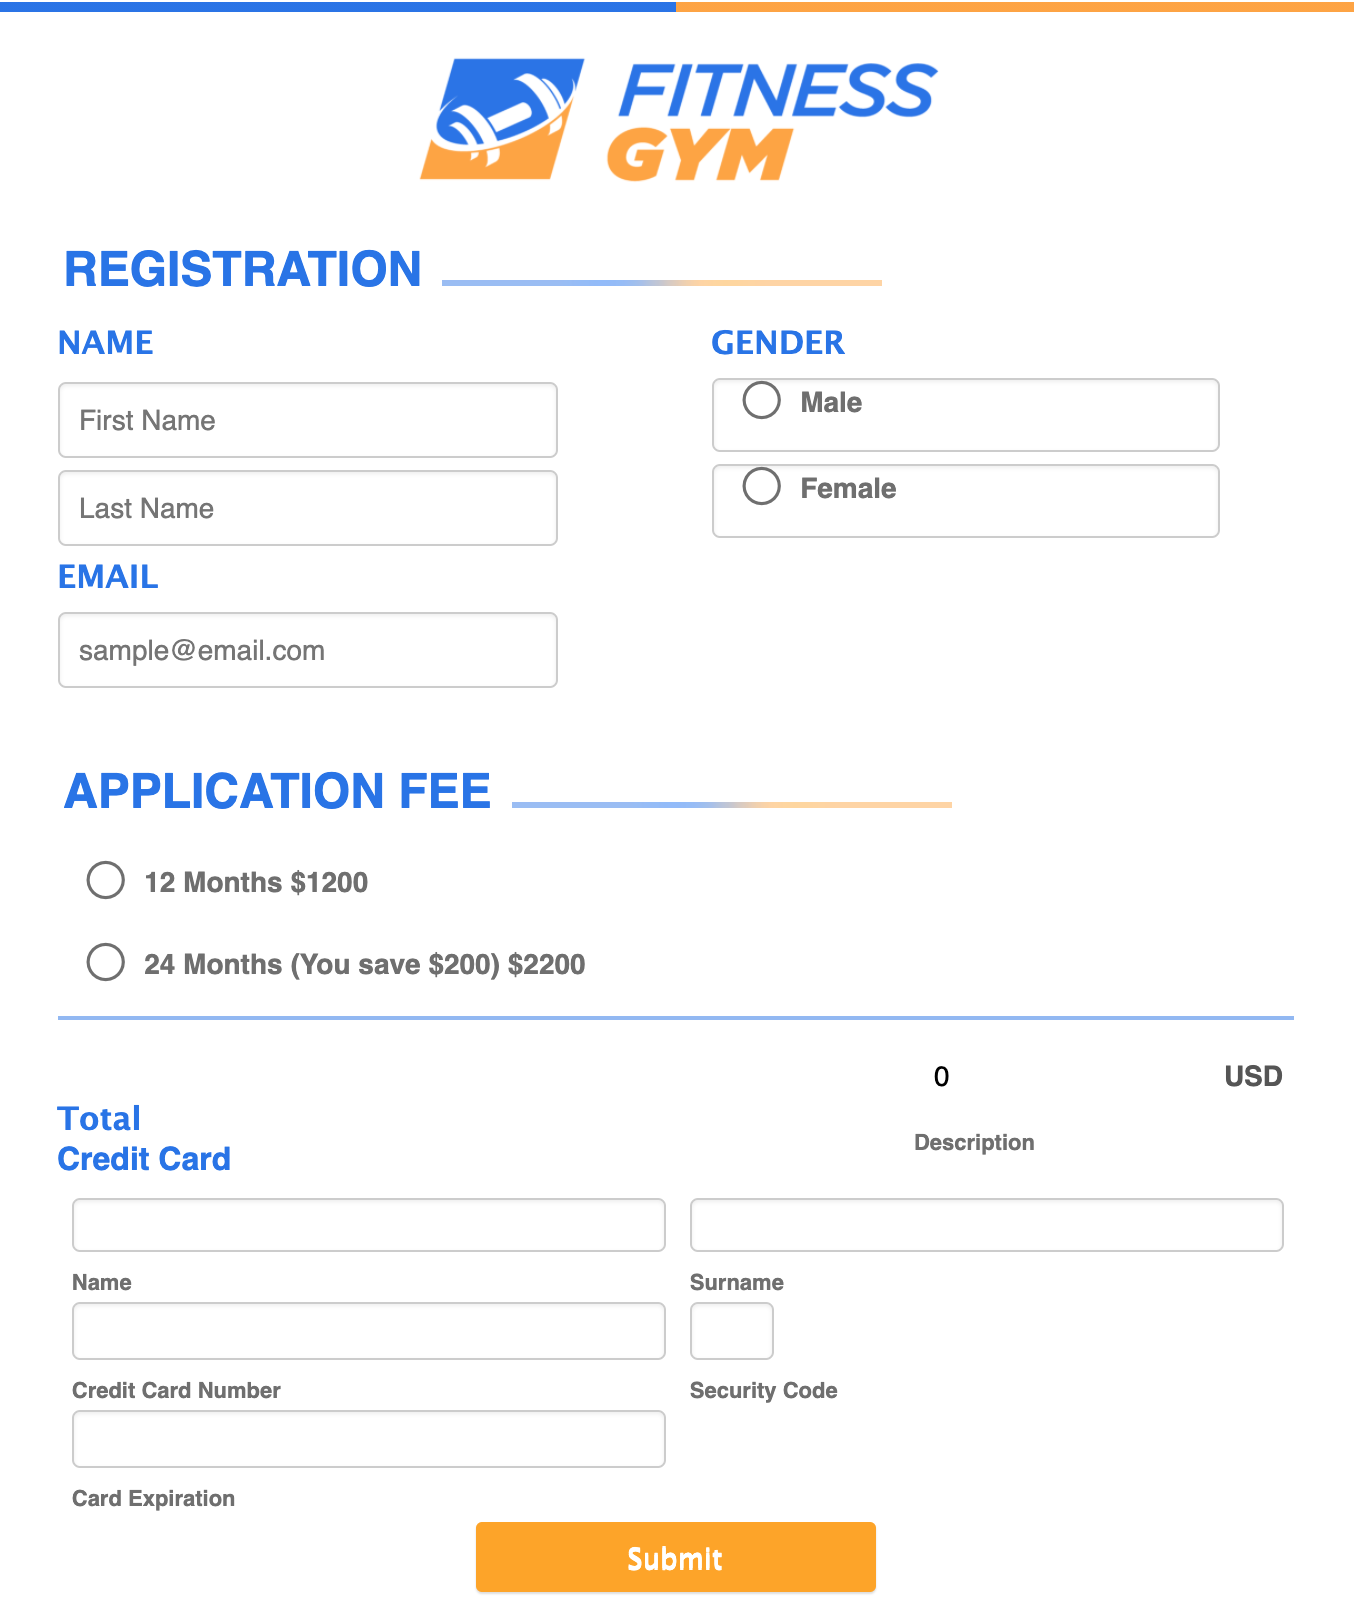 Fitness Gym Registration Form Template